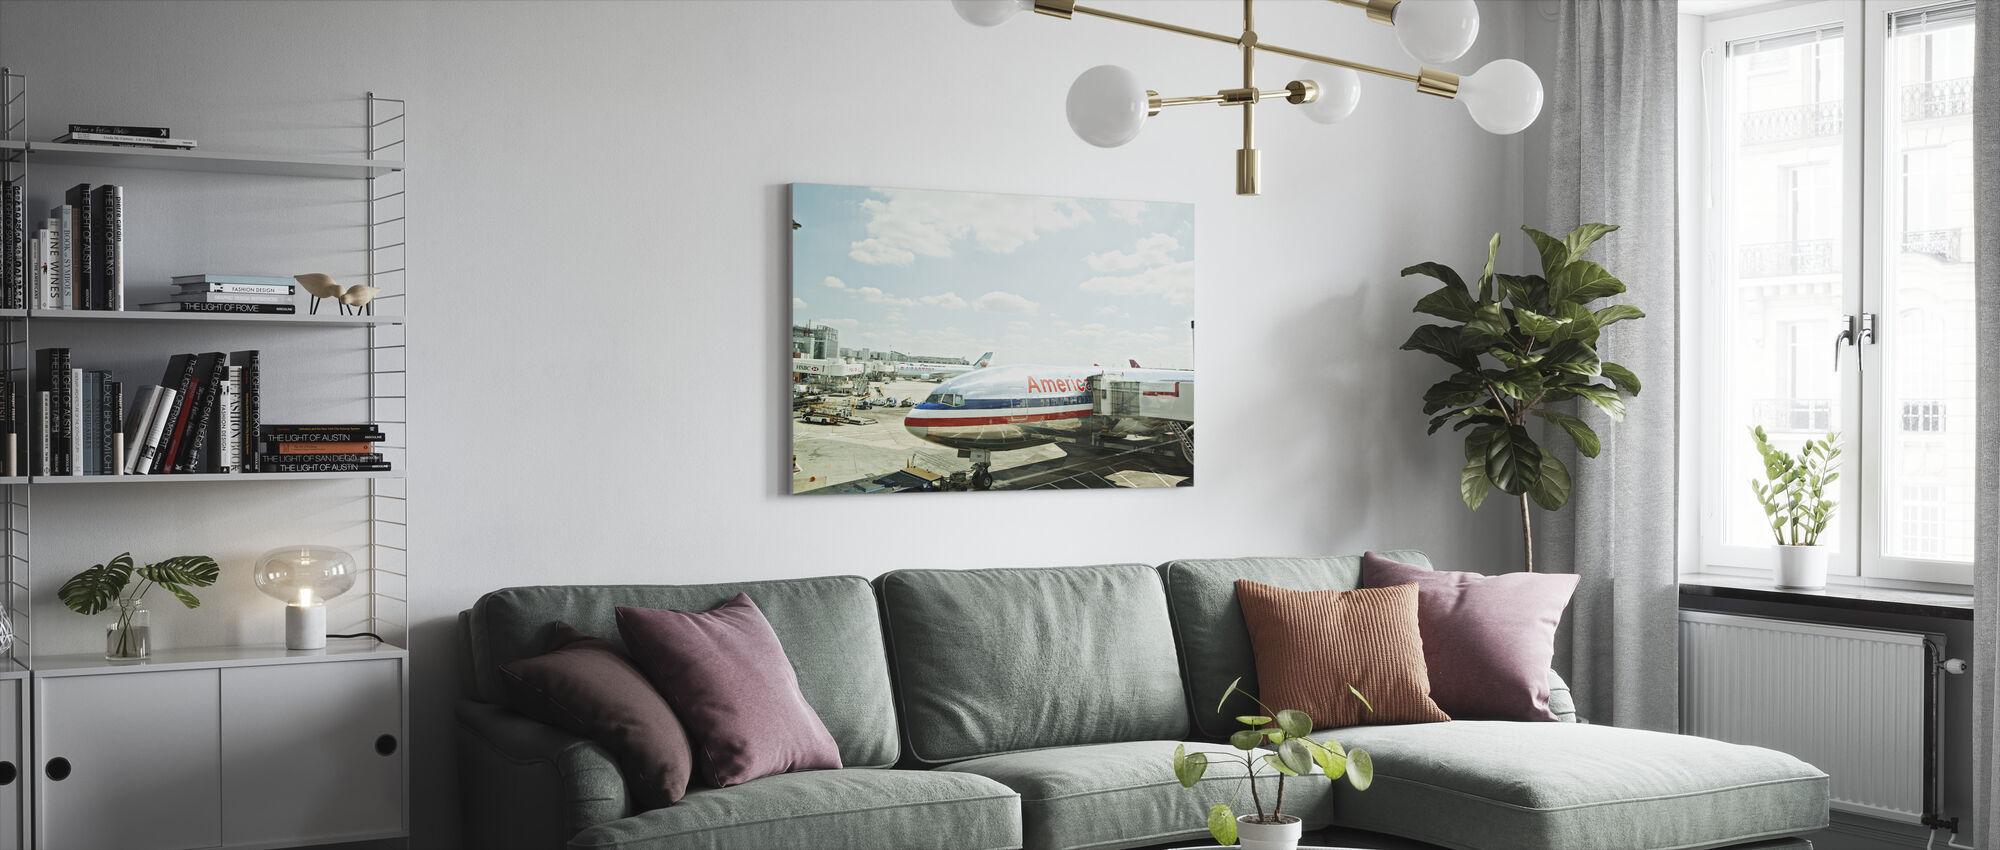 Flygplan i Heathrow, England - Lerretsbilde - Stue